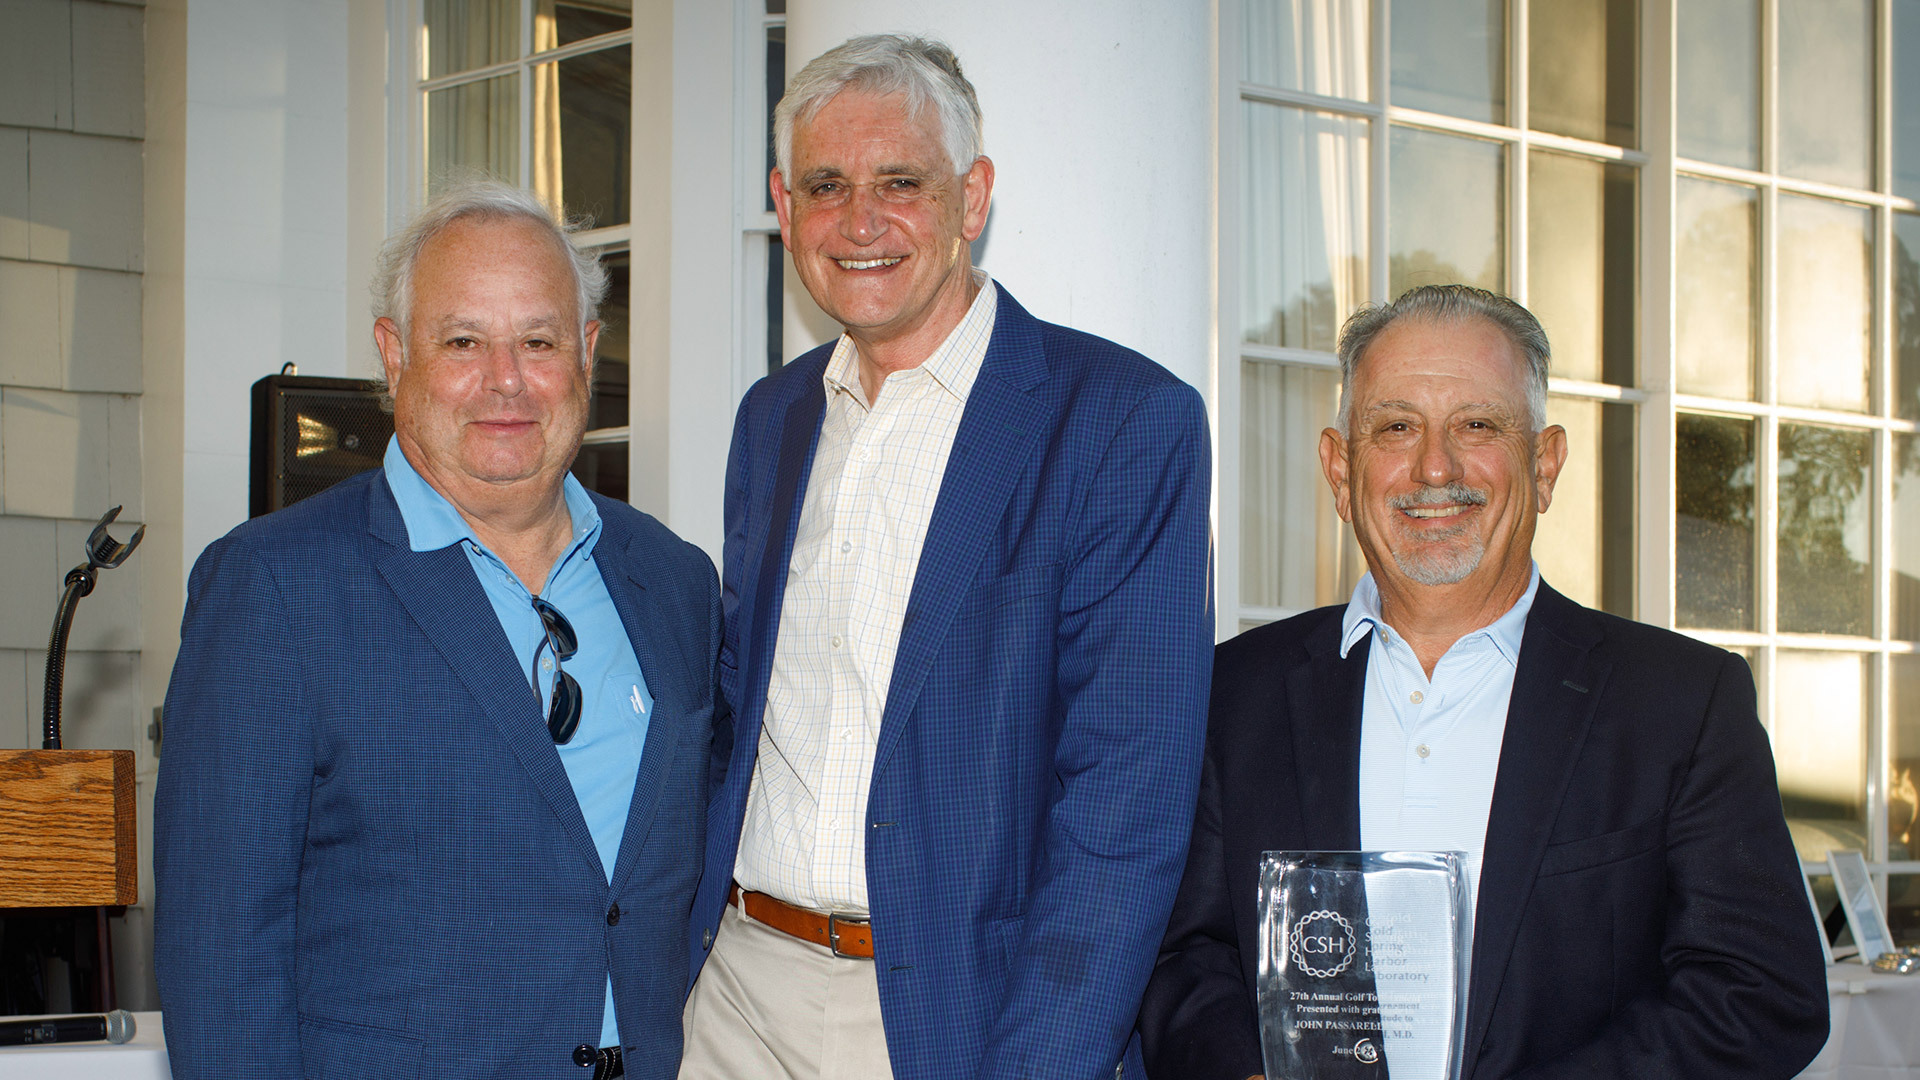 photo of Eddie Chernoff, Bruce Stillman, and John Passarelli